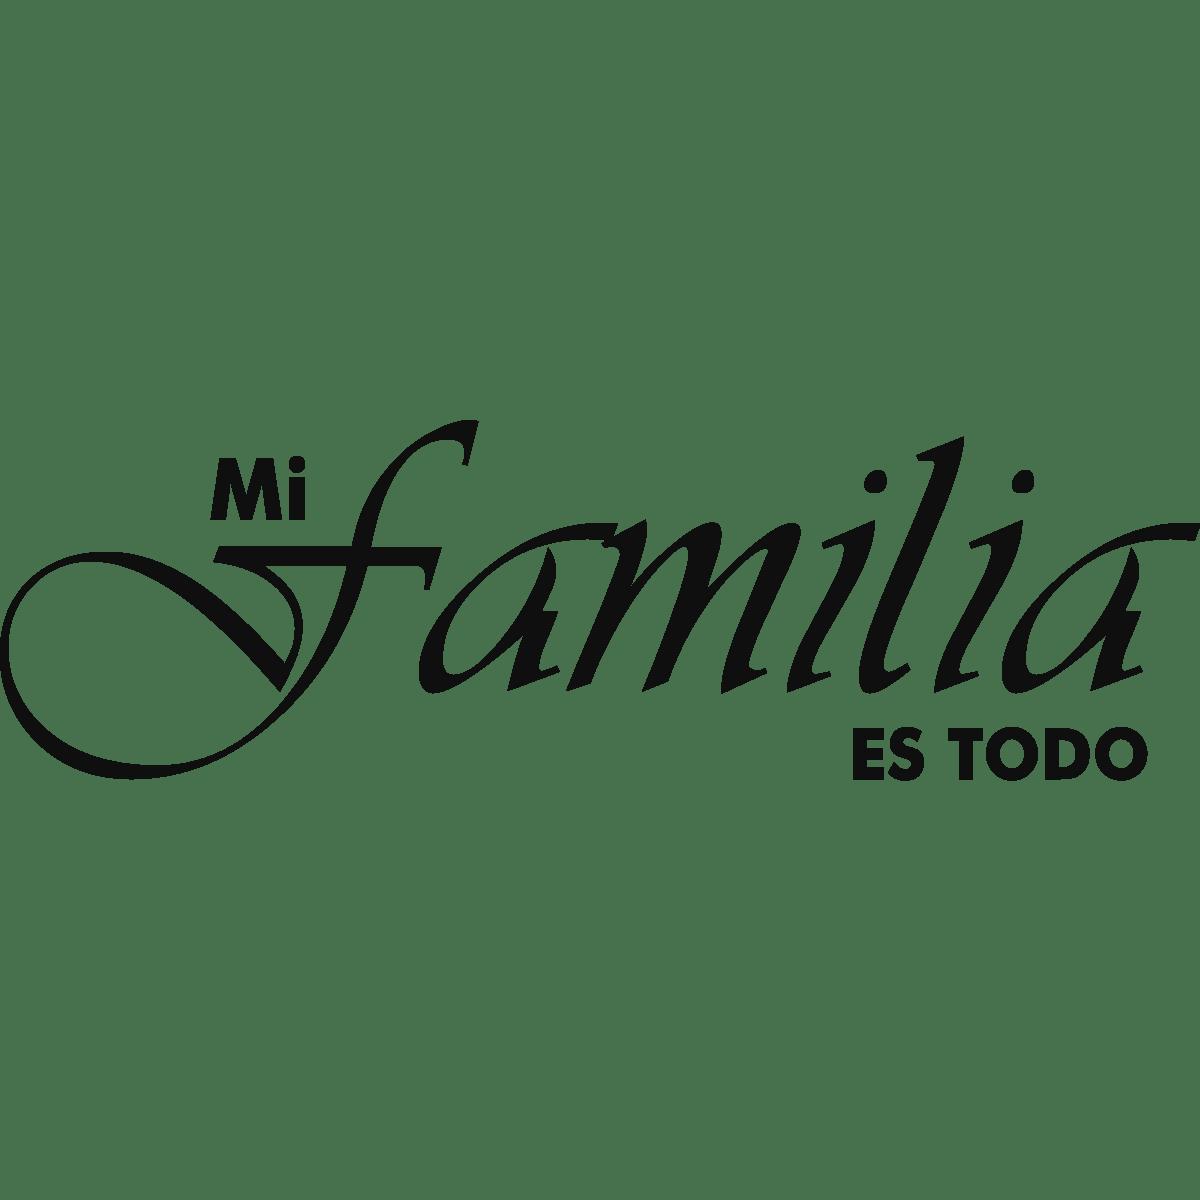 Sticker Citation Espagnol